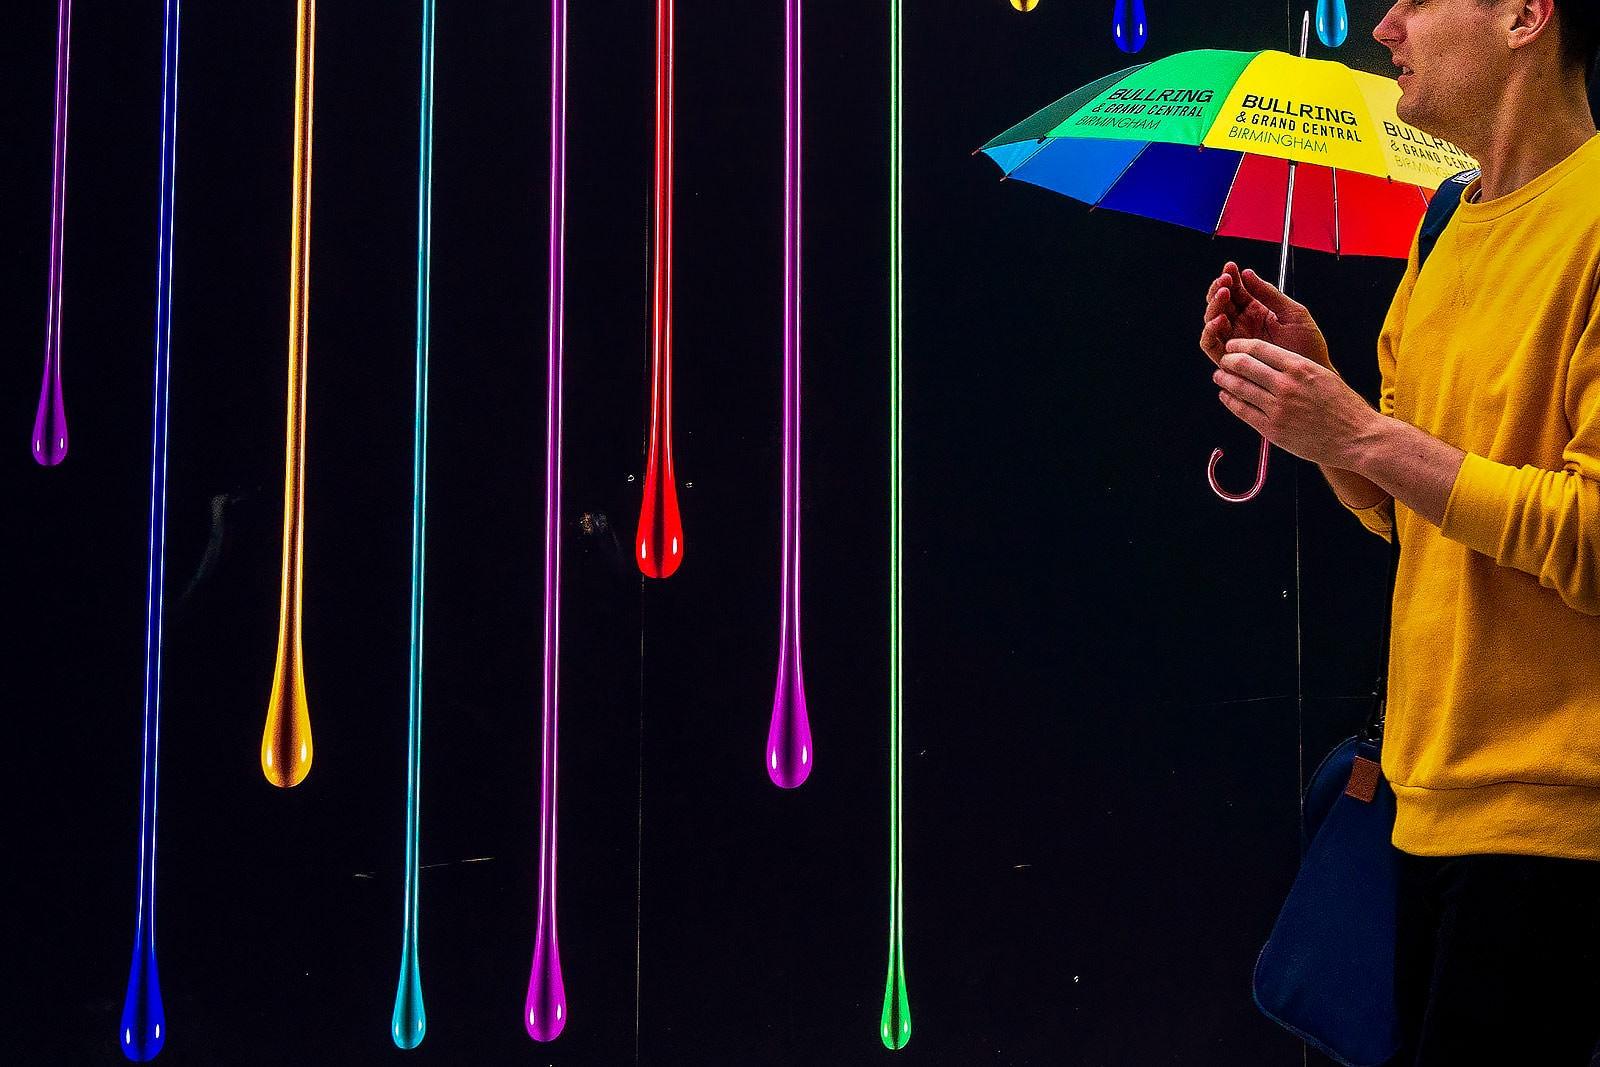 UK street photographer Dan Morris